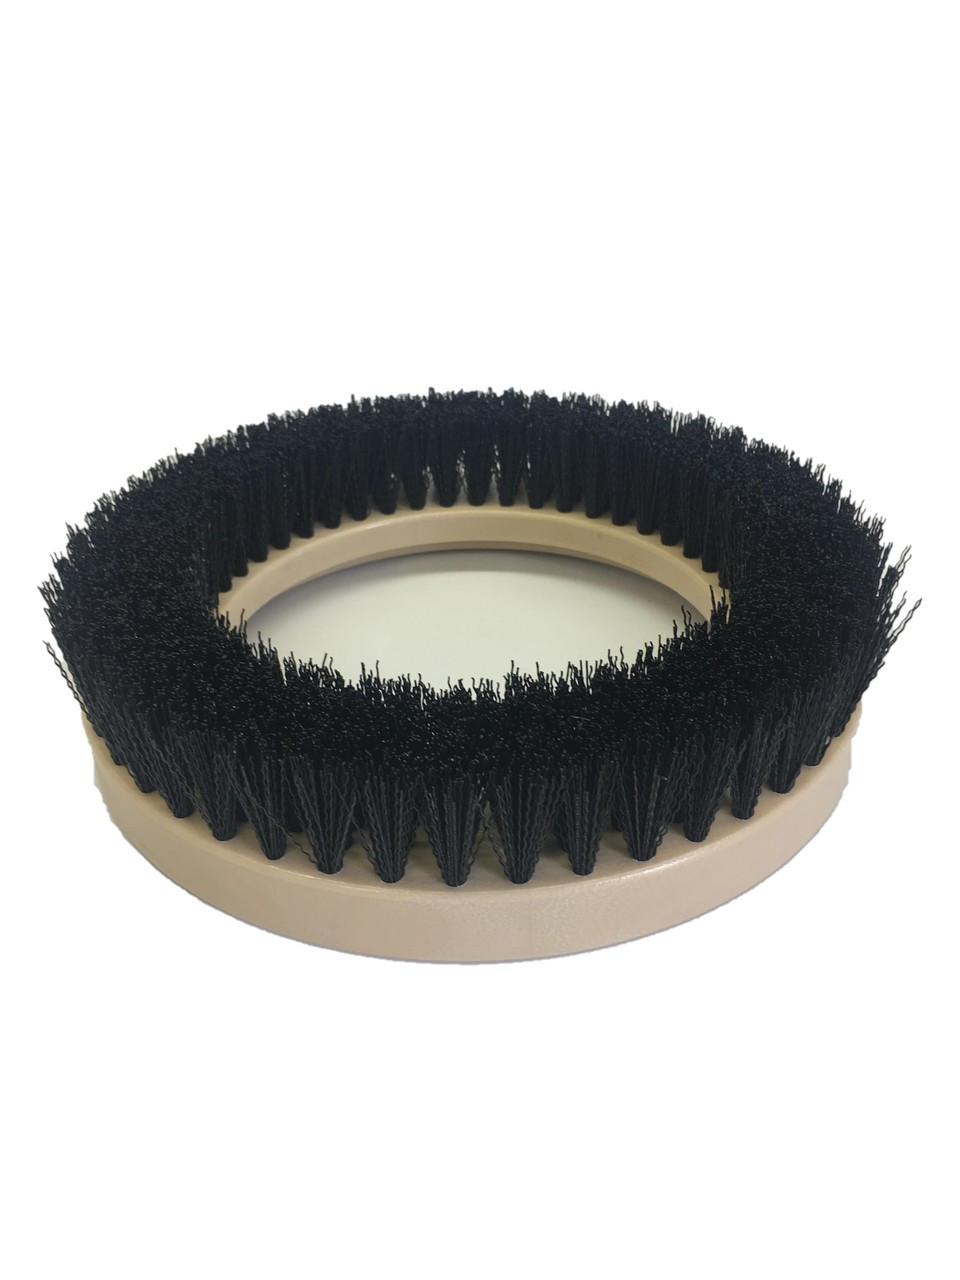 "9"" Flat Coarse Brush, 1.25"" bristle, Nylon, #3 brush alone"